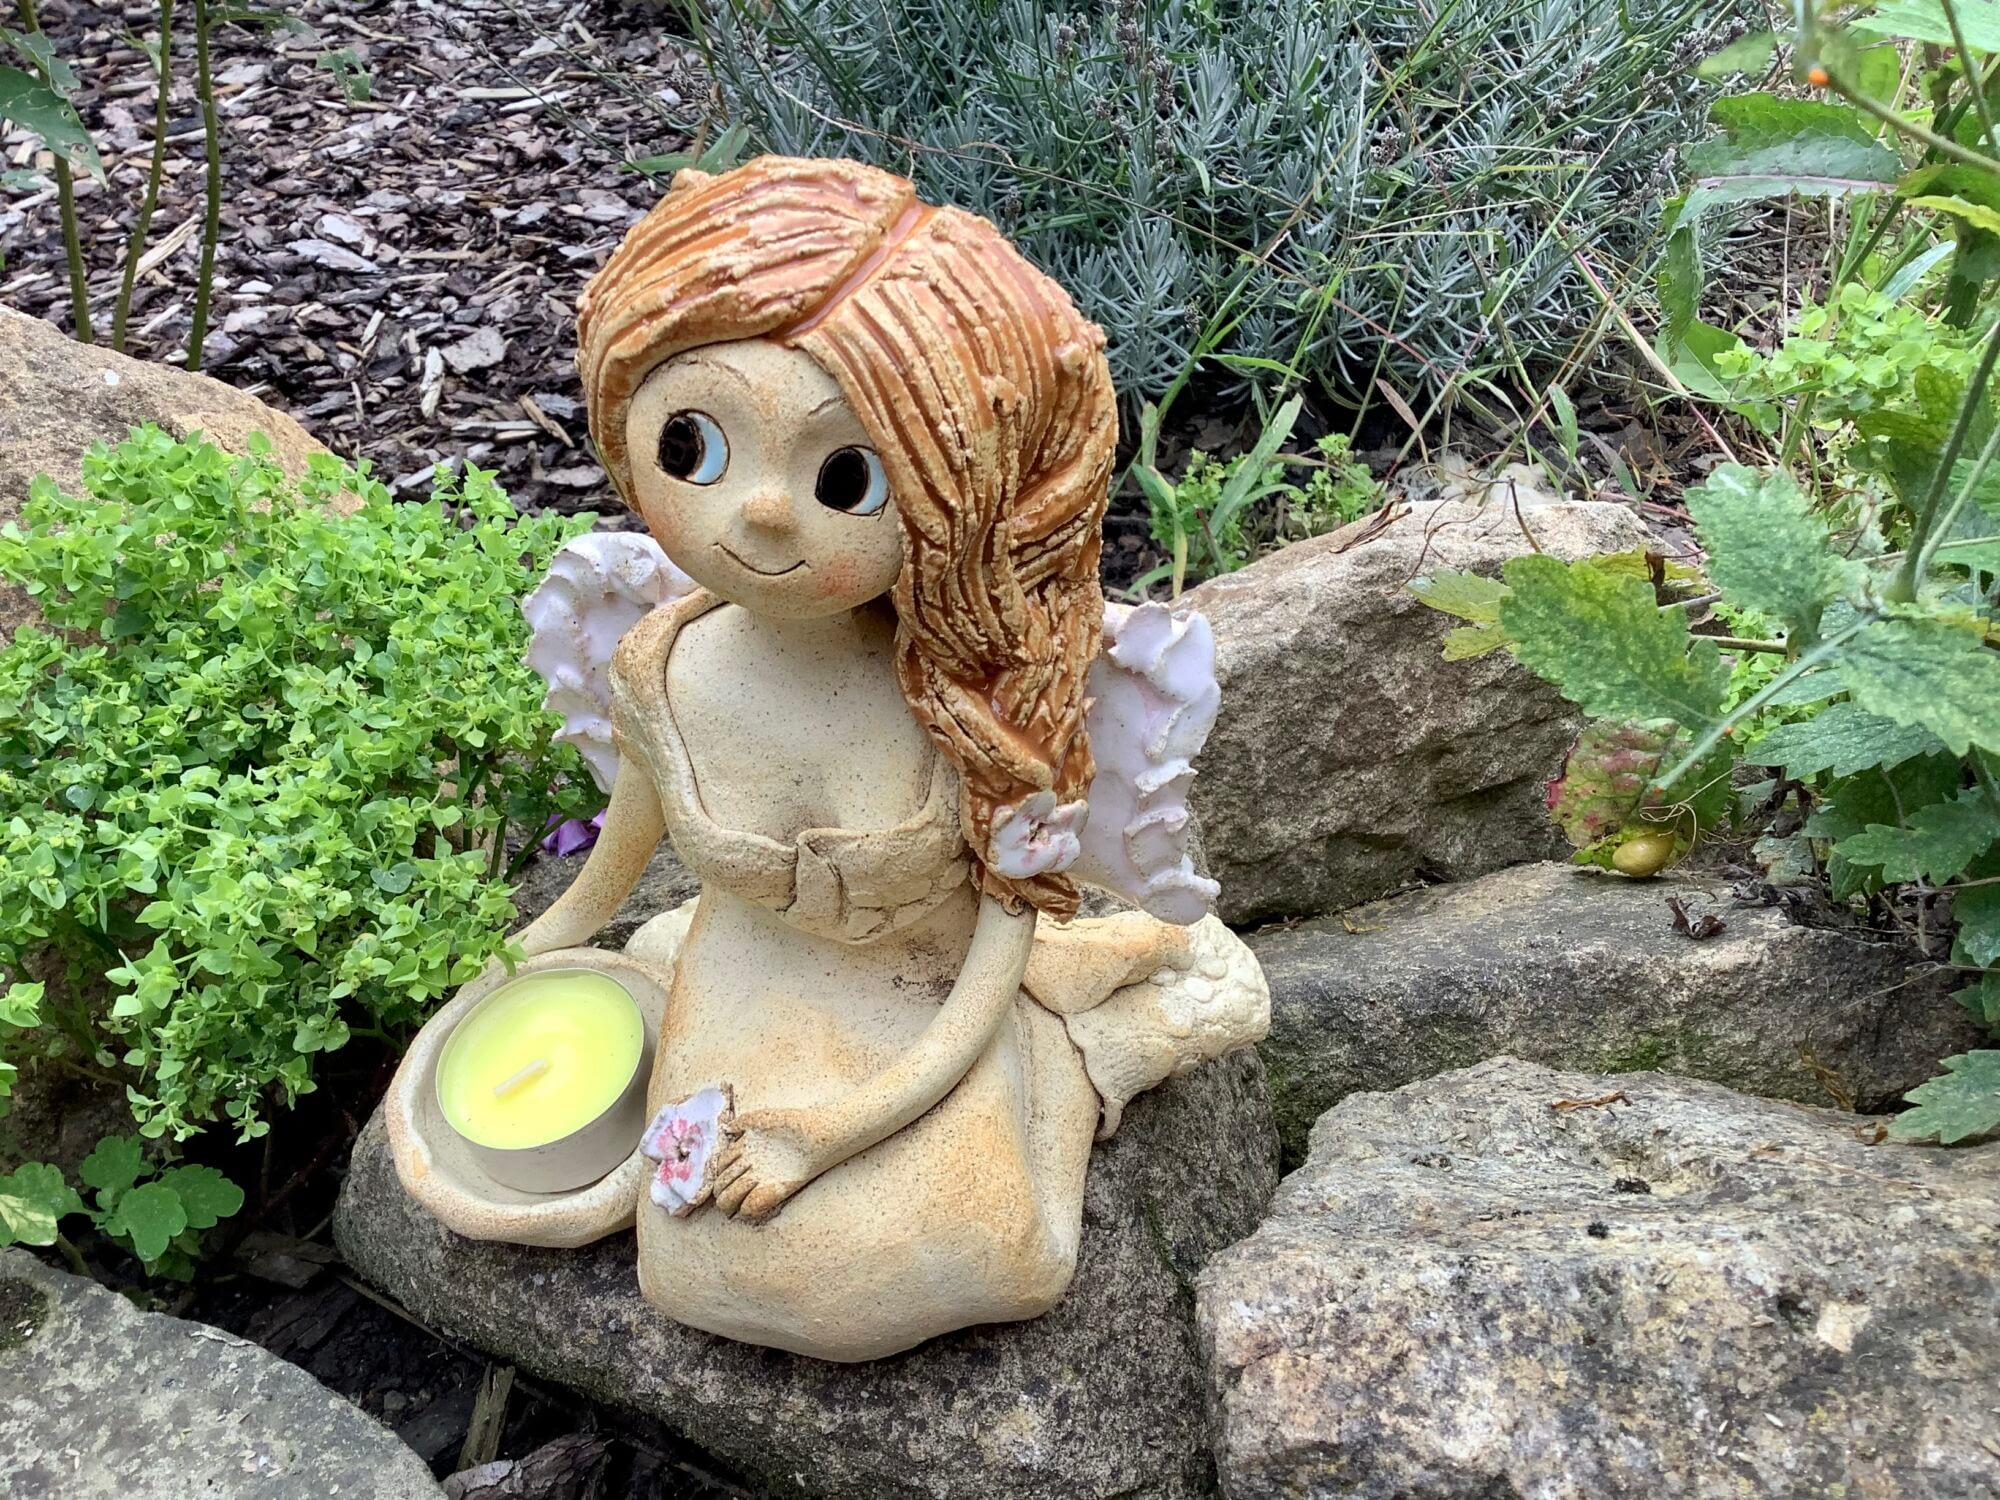 Andelka jasmín květ křídla panenka dekorace soška keramikaandee Keramická dekorace